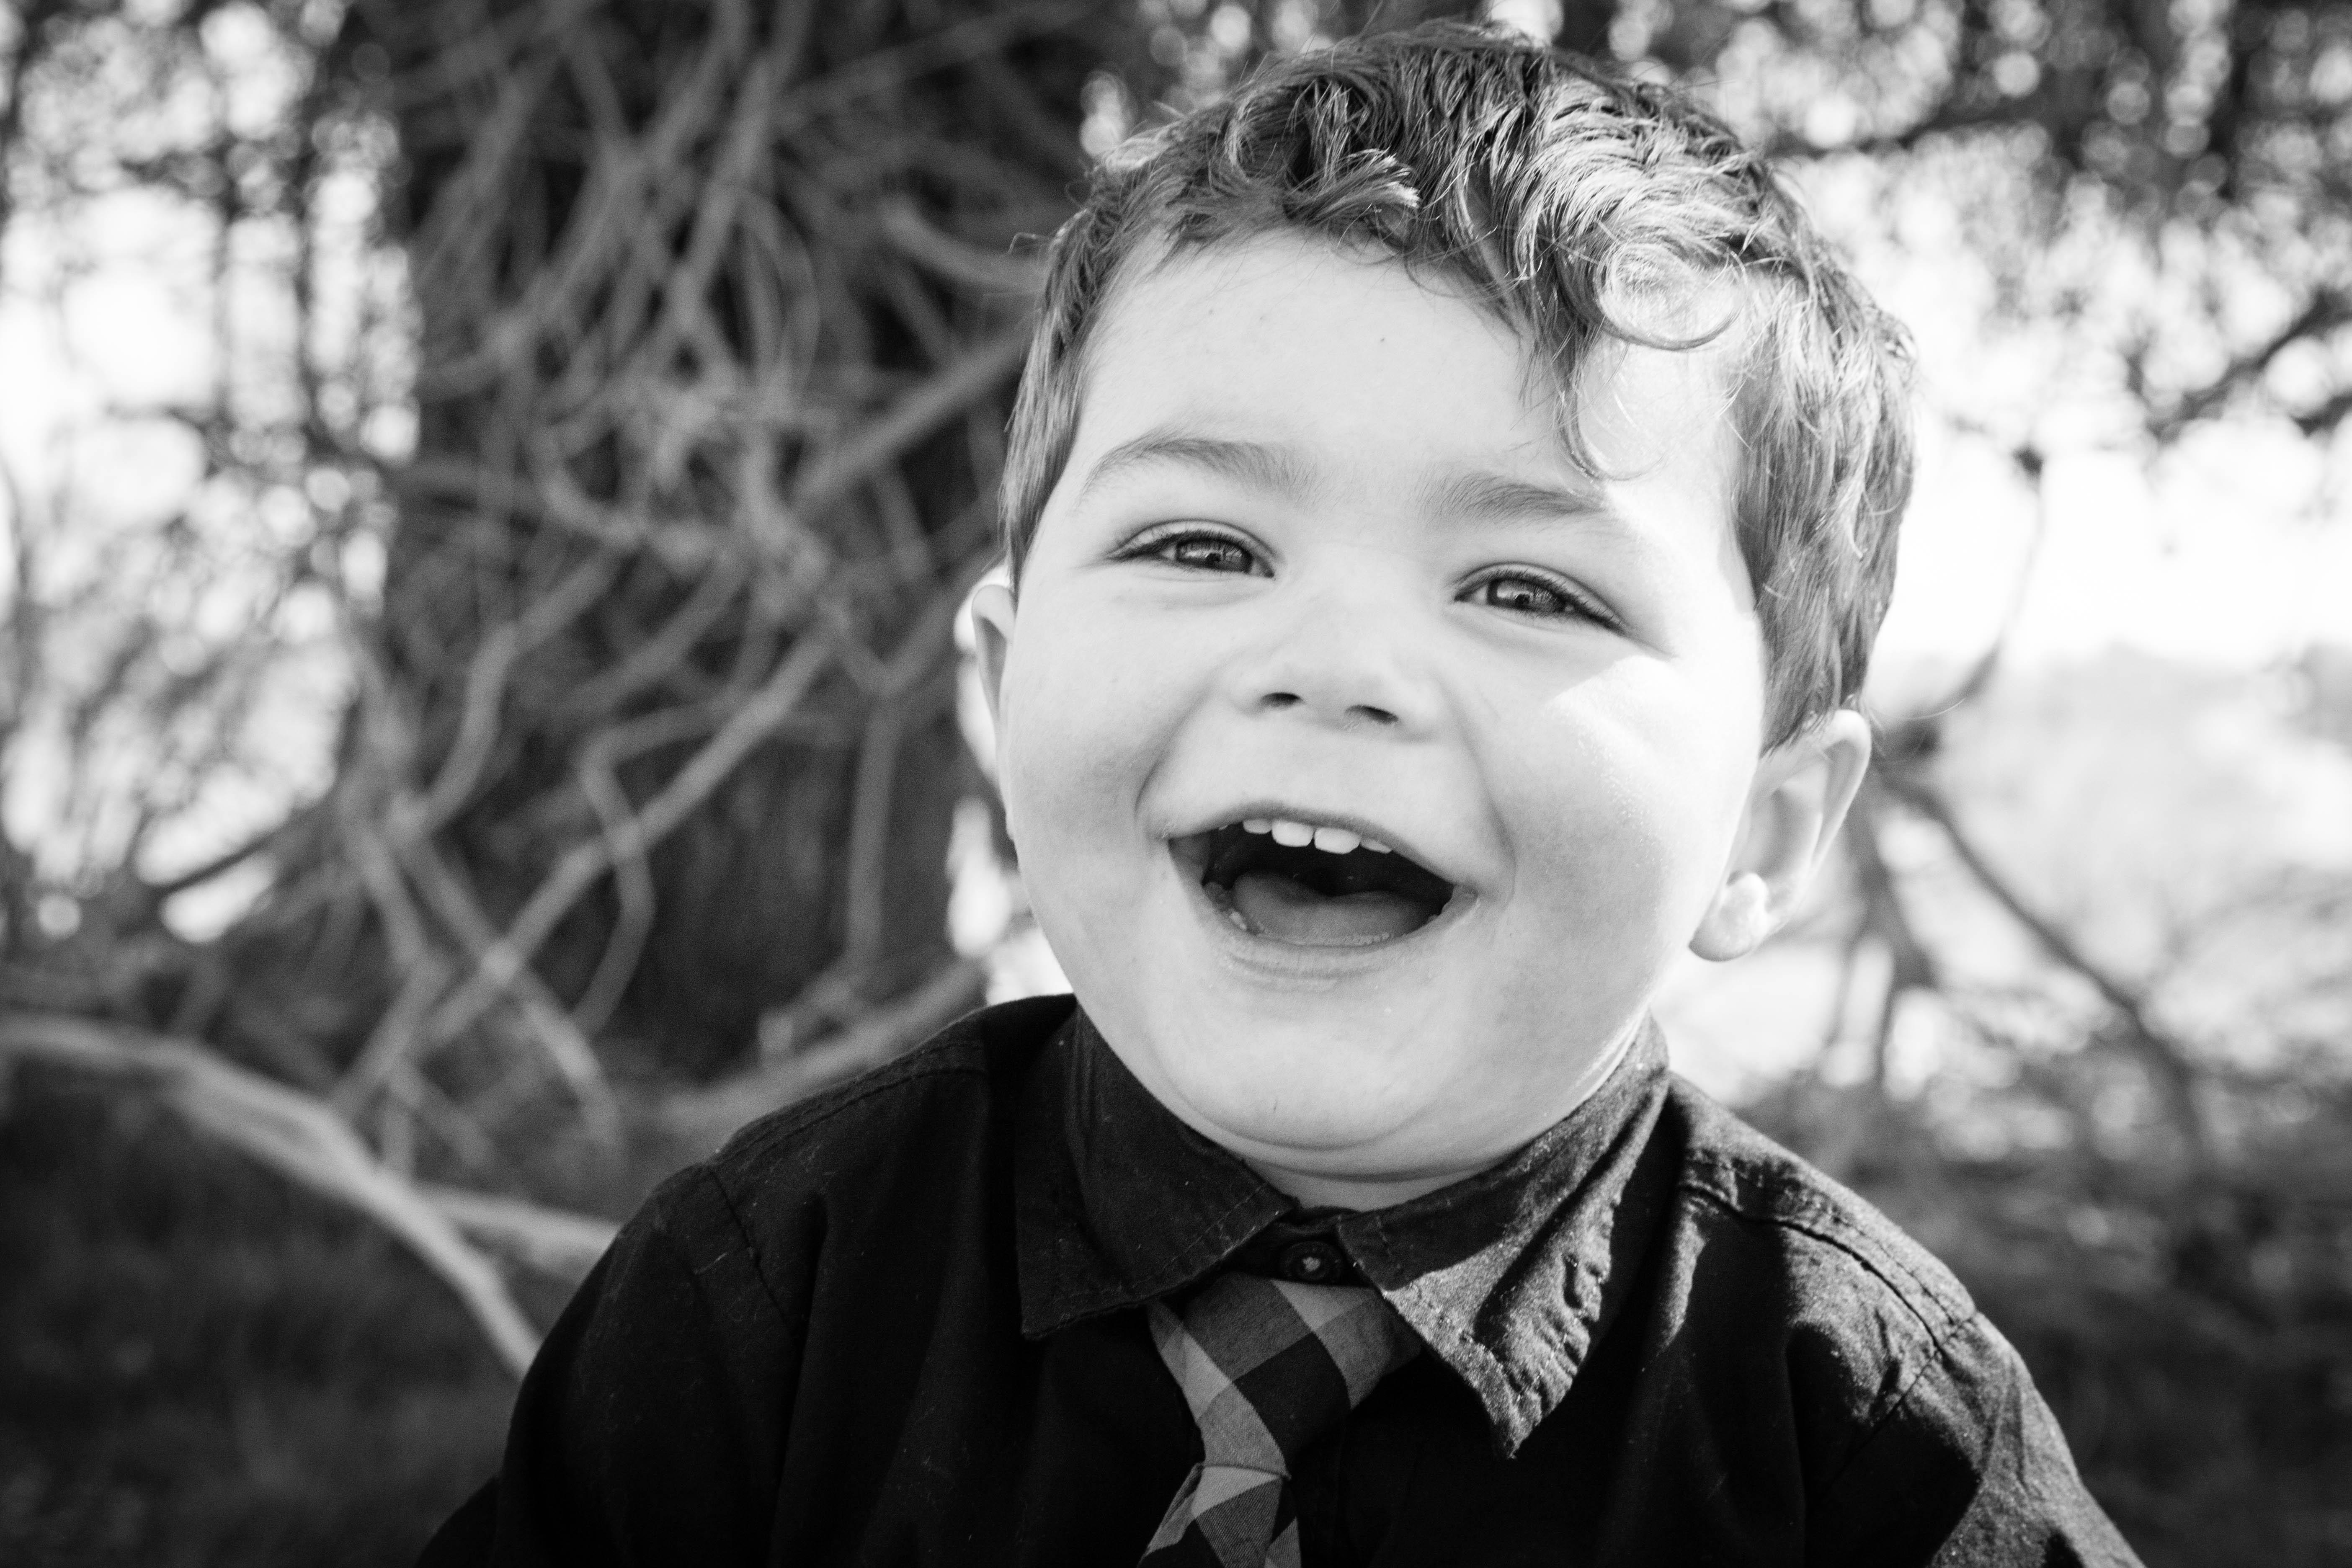 Tehachapi - Nilas - Family - Children - Photography - Photographer-1470-2